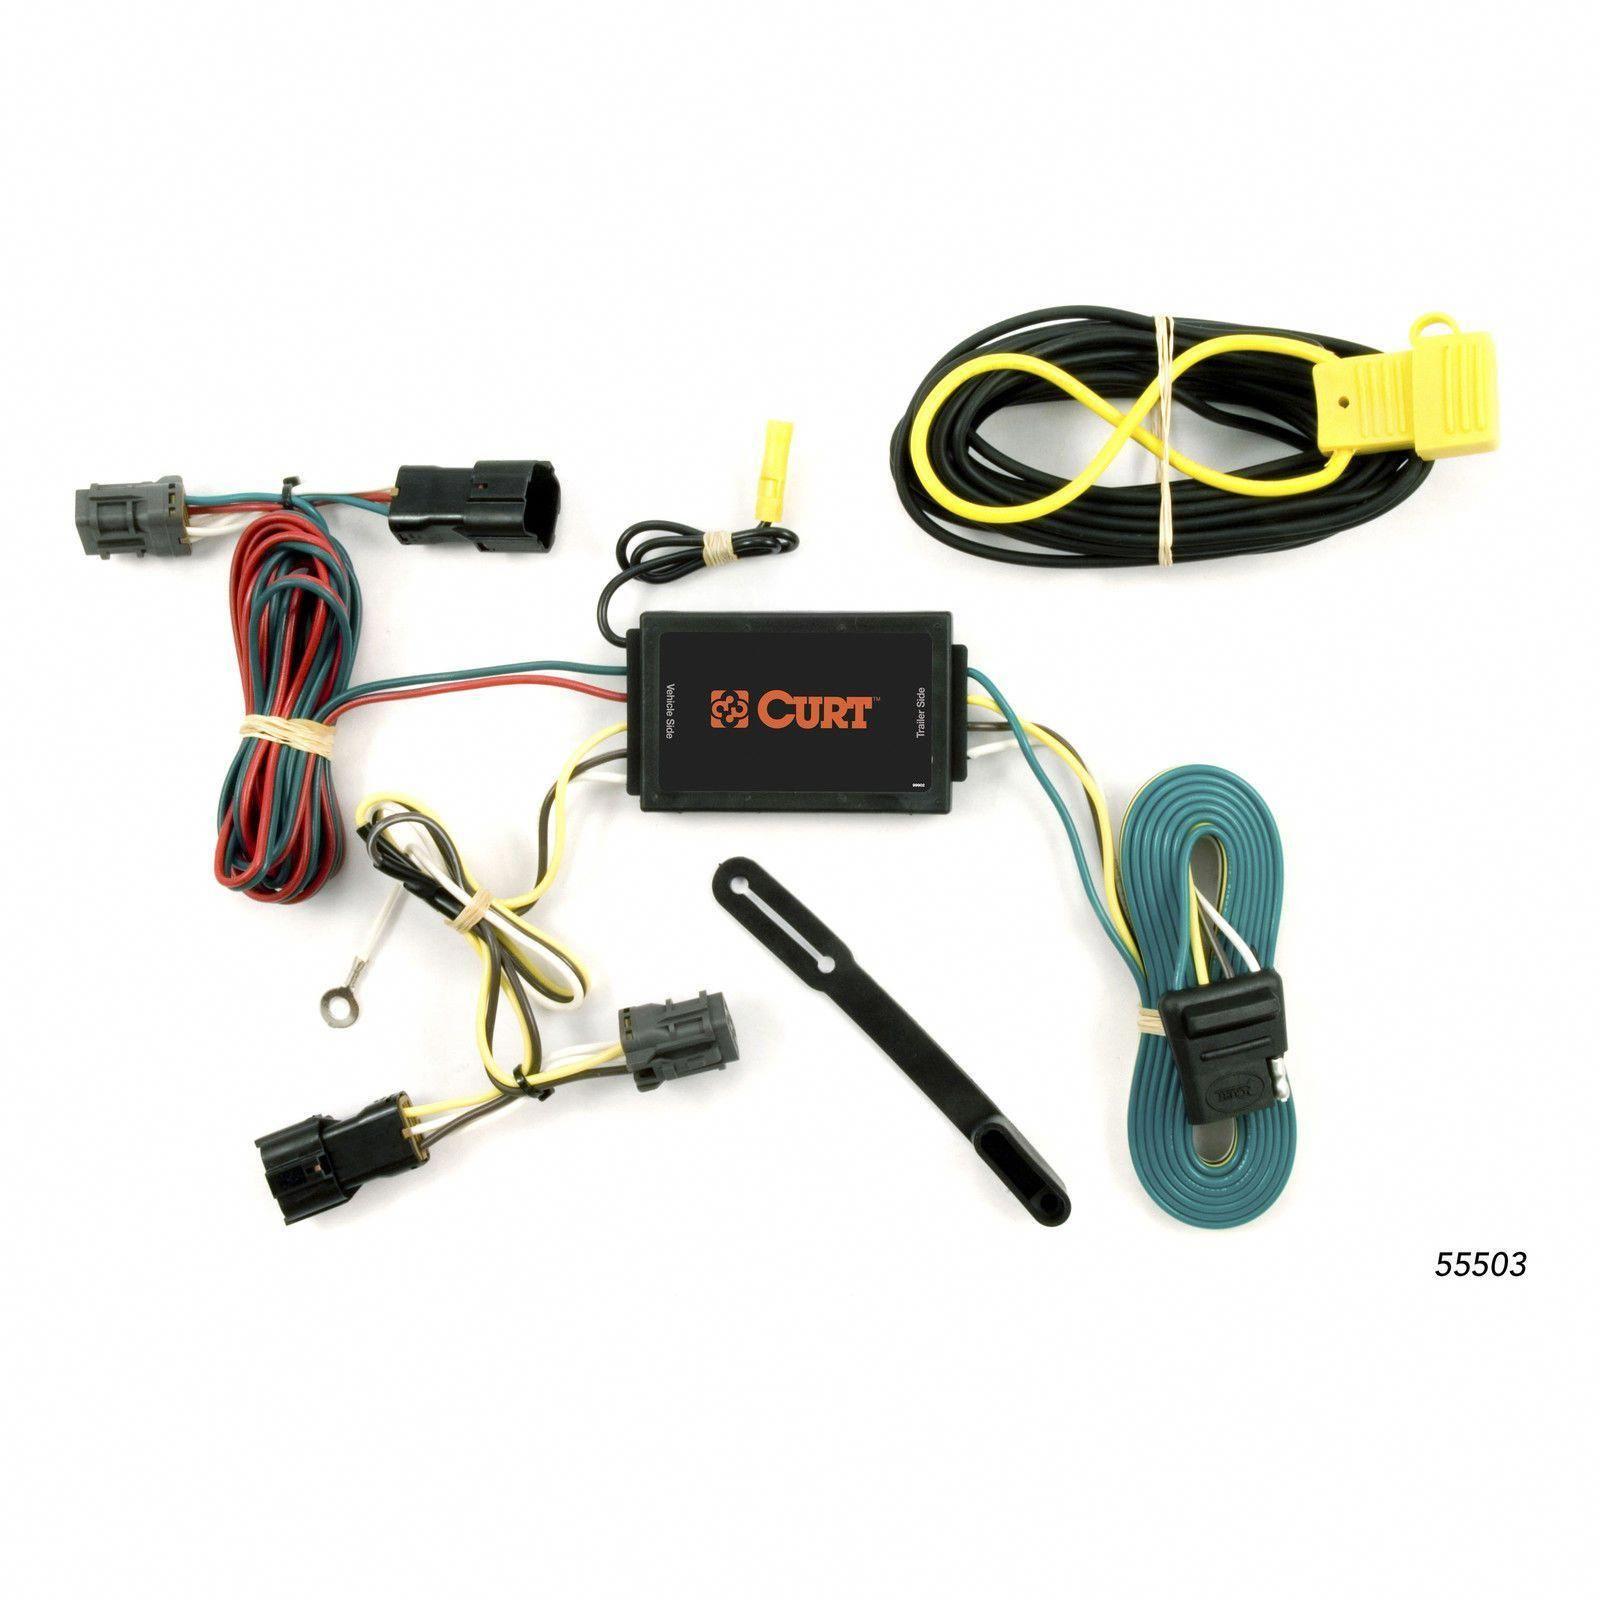 medium resolution of curt 55503 wiring harness for 07 09 hyundai entourage 06 14 kia sedona kiasedona